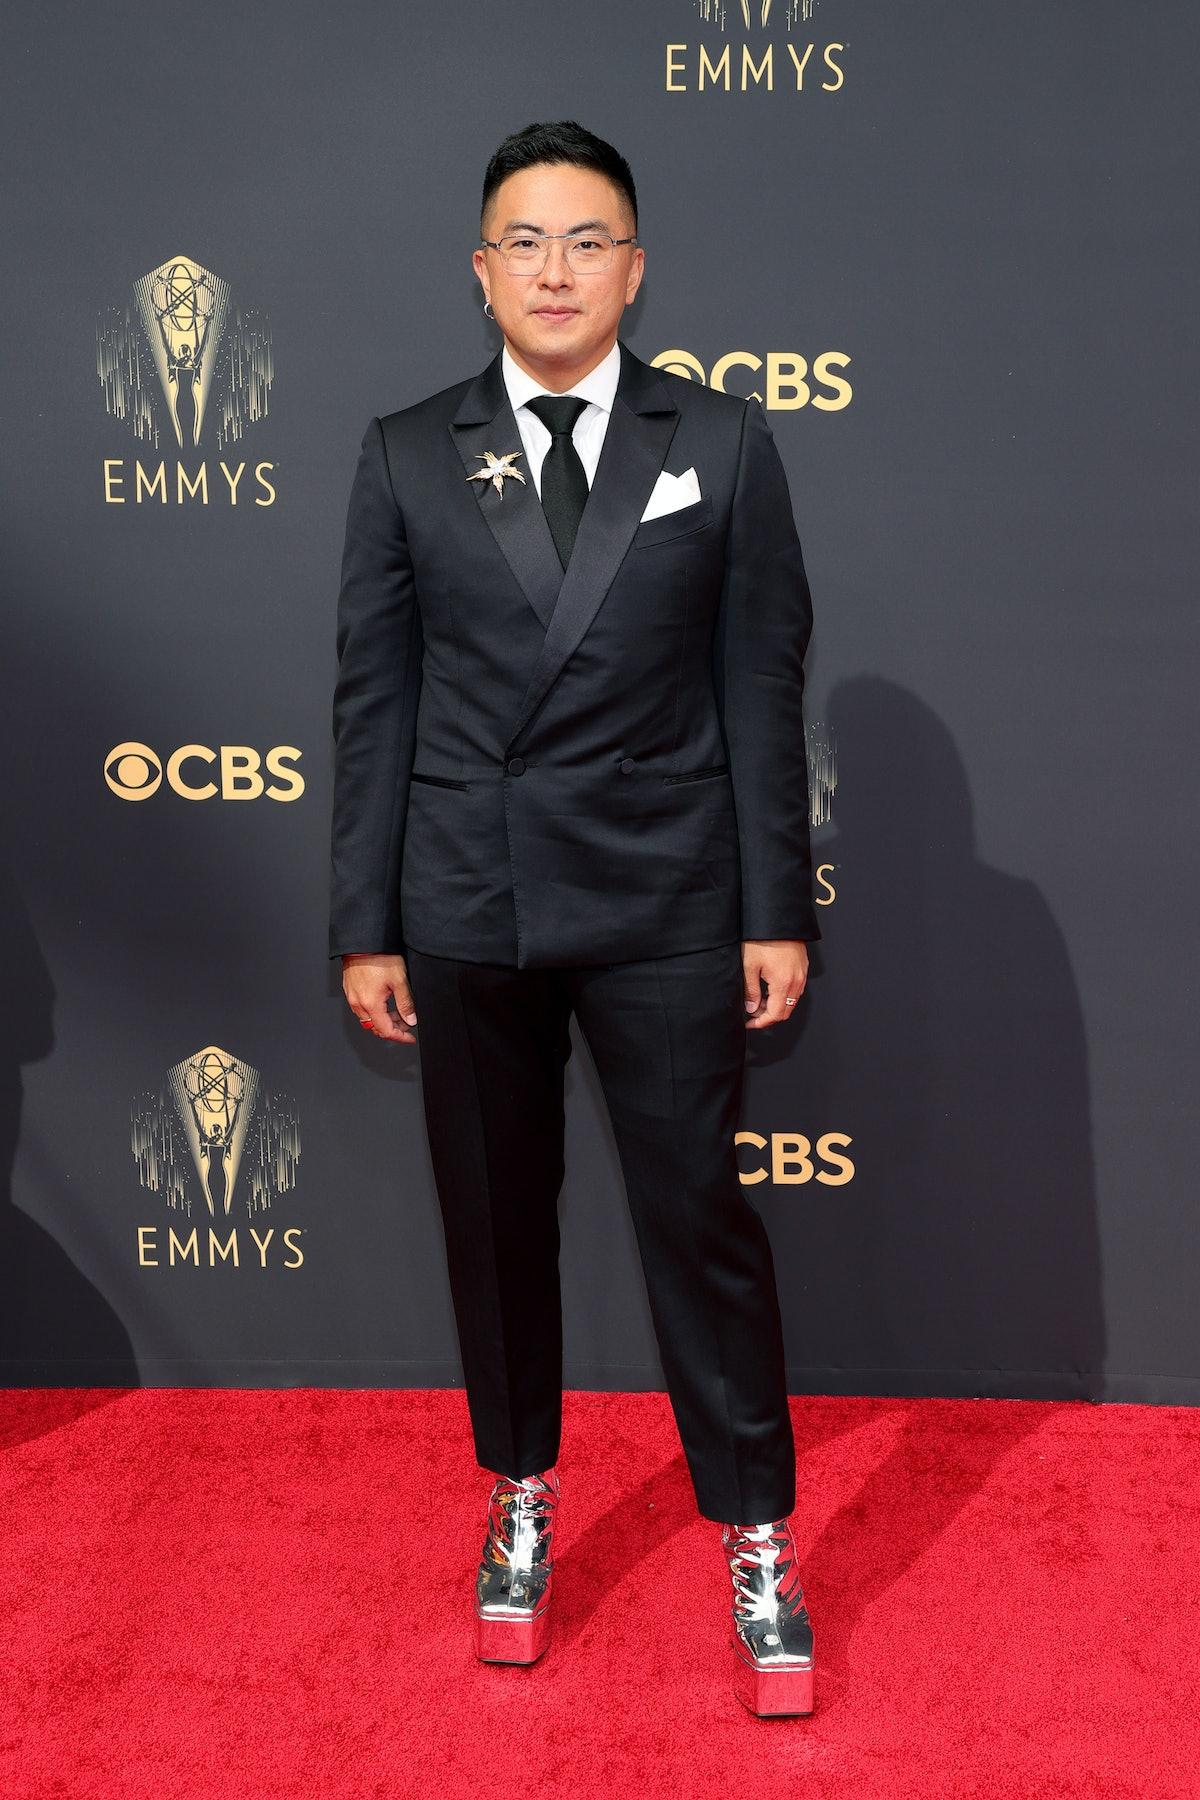 LOS ANGELES, CALIFORNIA - SEPTEMBER 19: Bowen Yang attends the 73rd Primetime Emmy Awards at LA LI ...